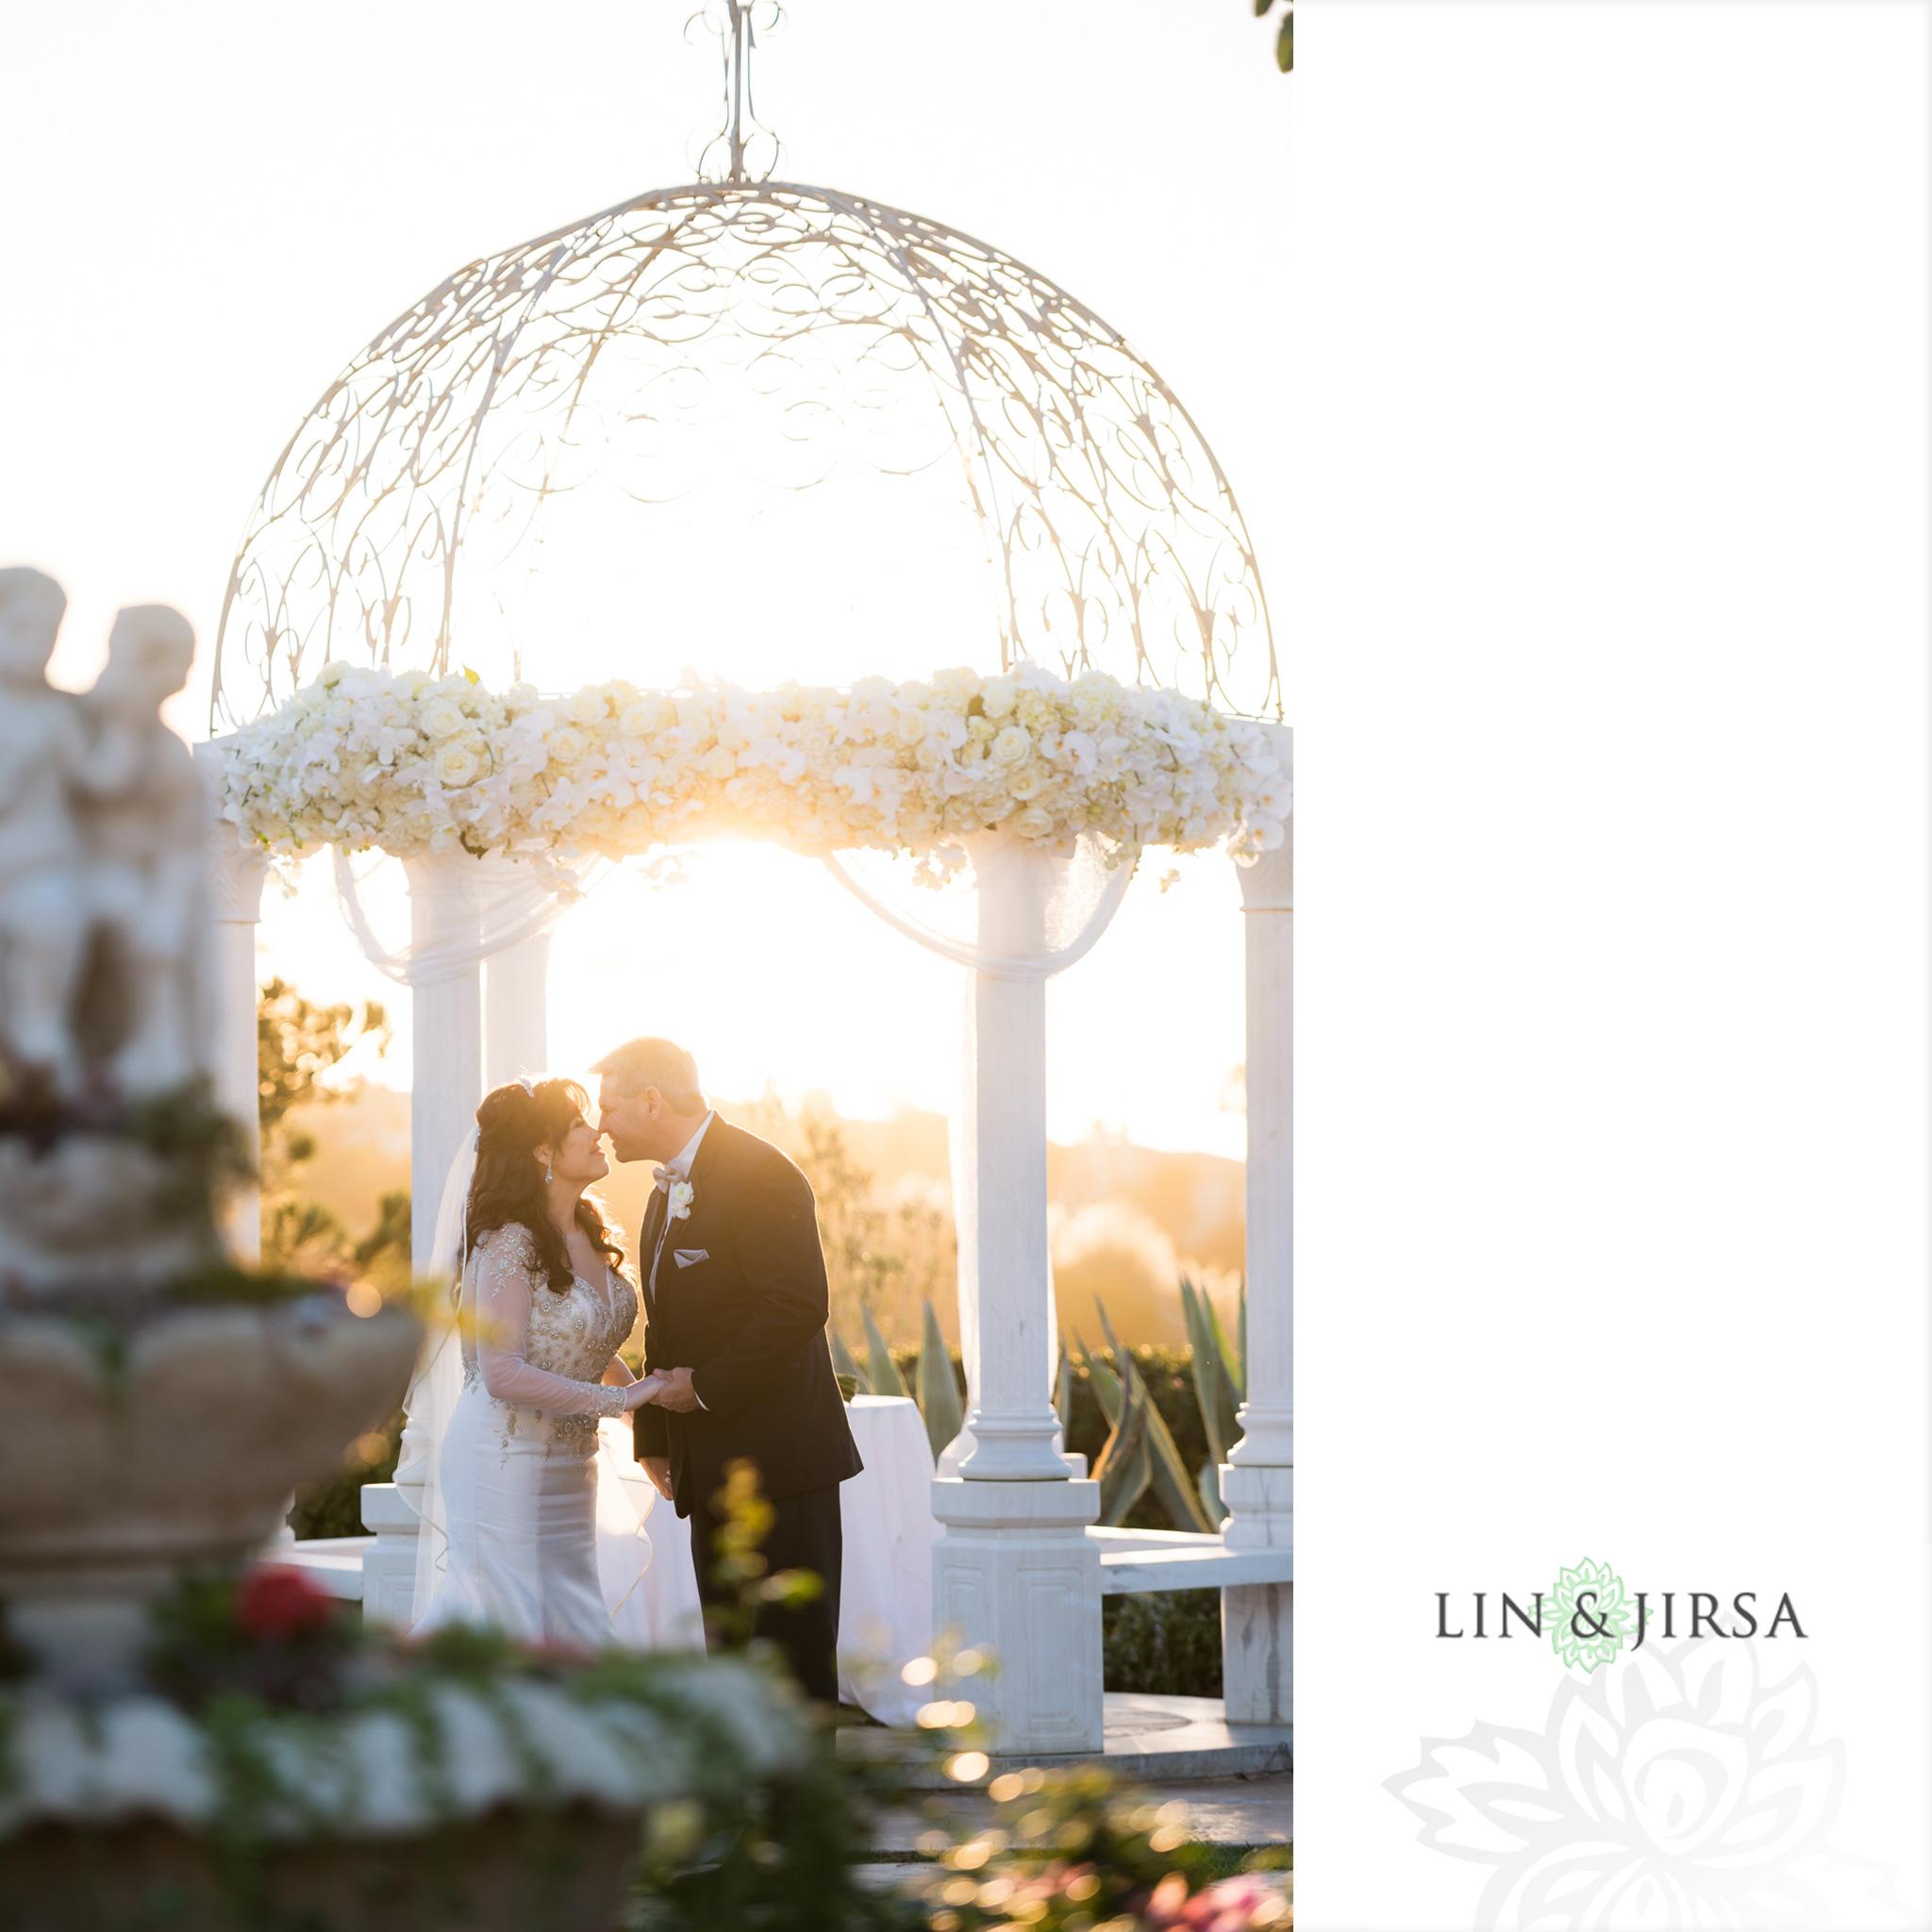 14-wish-upon-a-wedding-monarch-beach-resort-wedding-photography